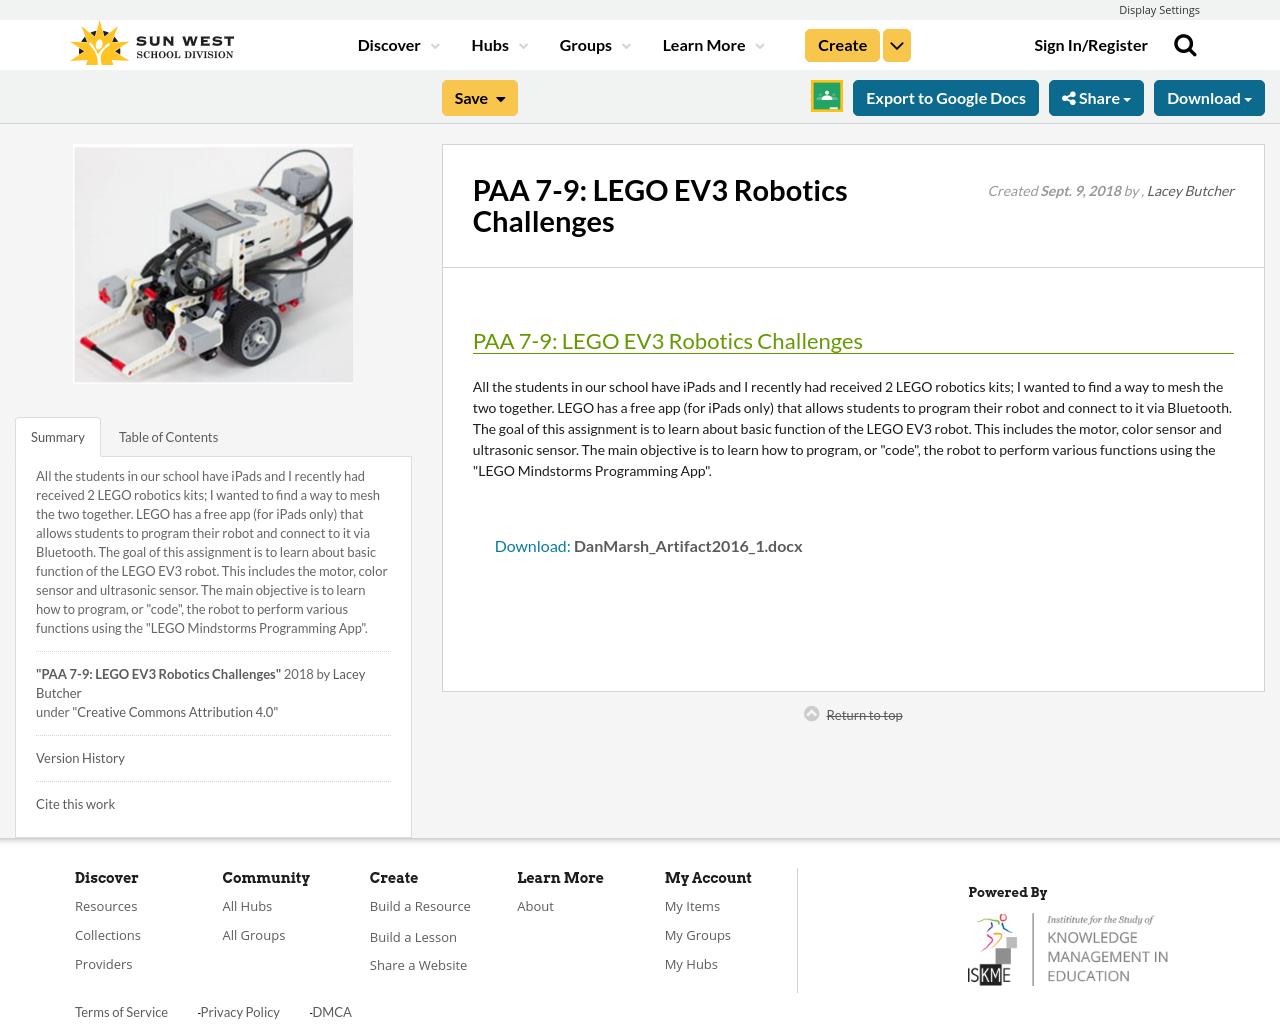 PAA 7-9: LEGO EV3 Robotics Challenges | Resource Bank